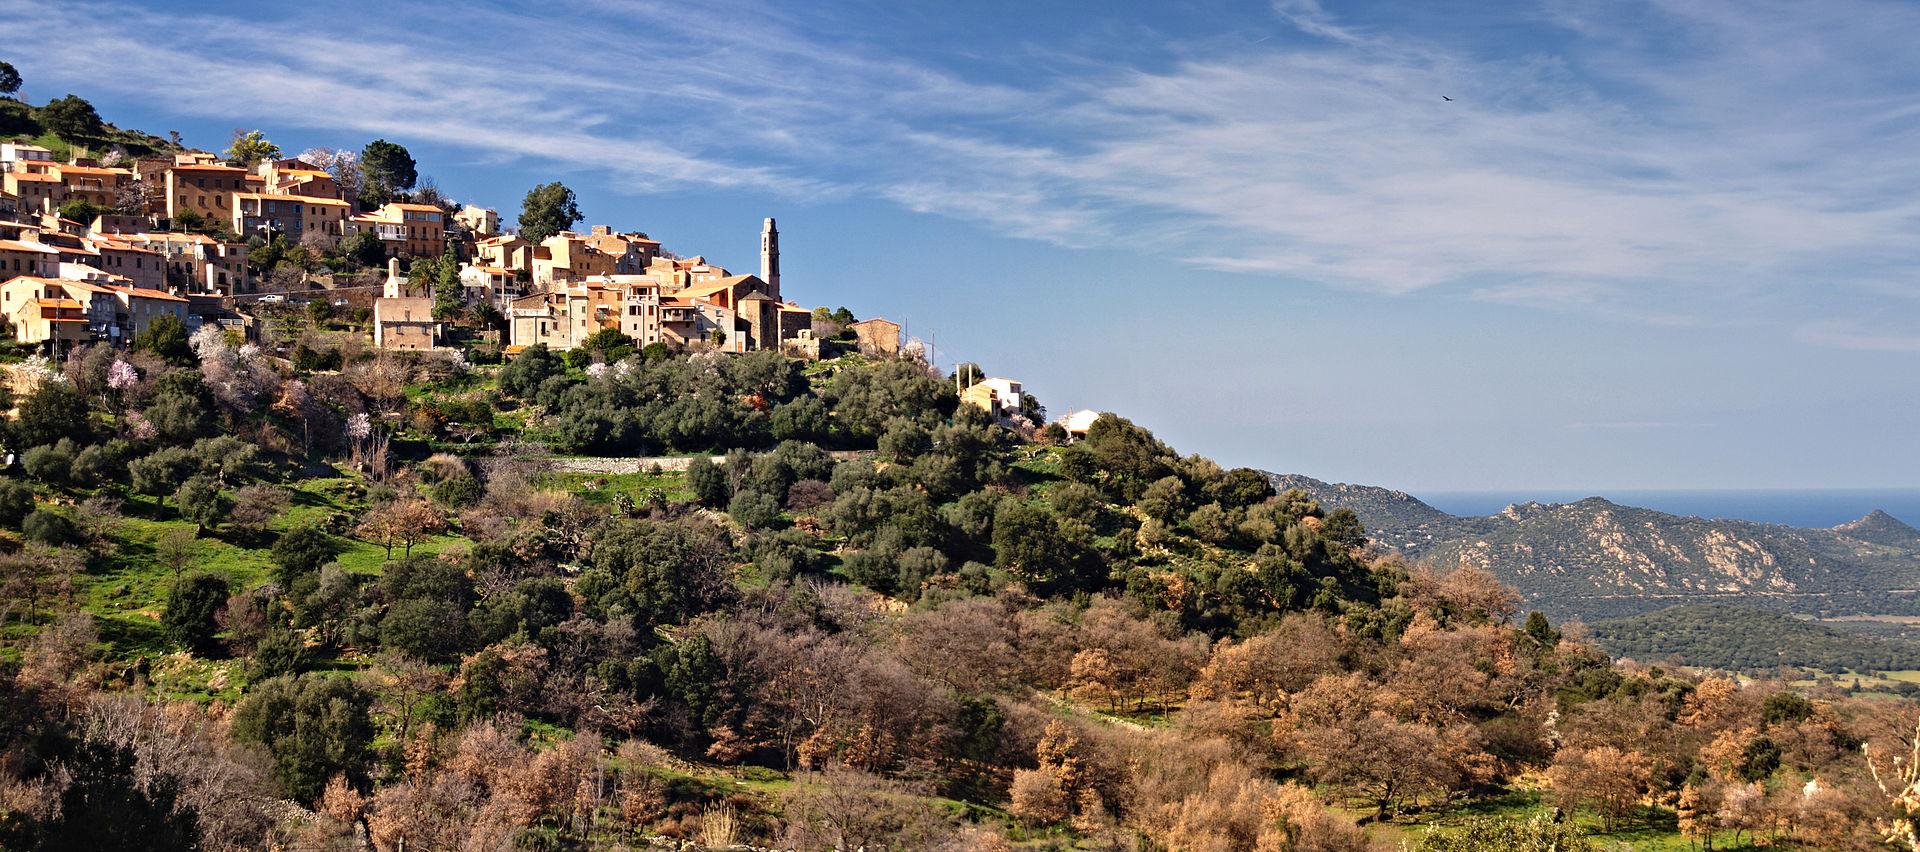 Occhiatana-village-pano.jpg